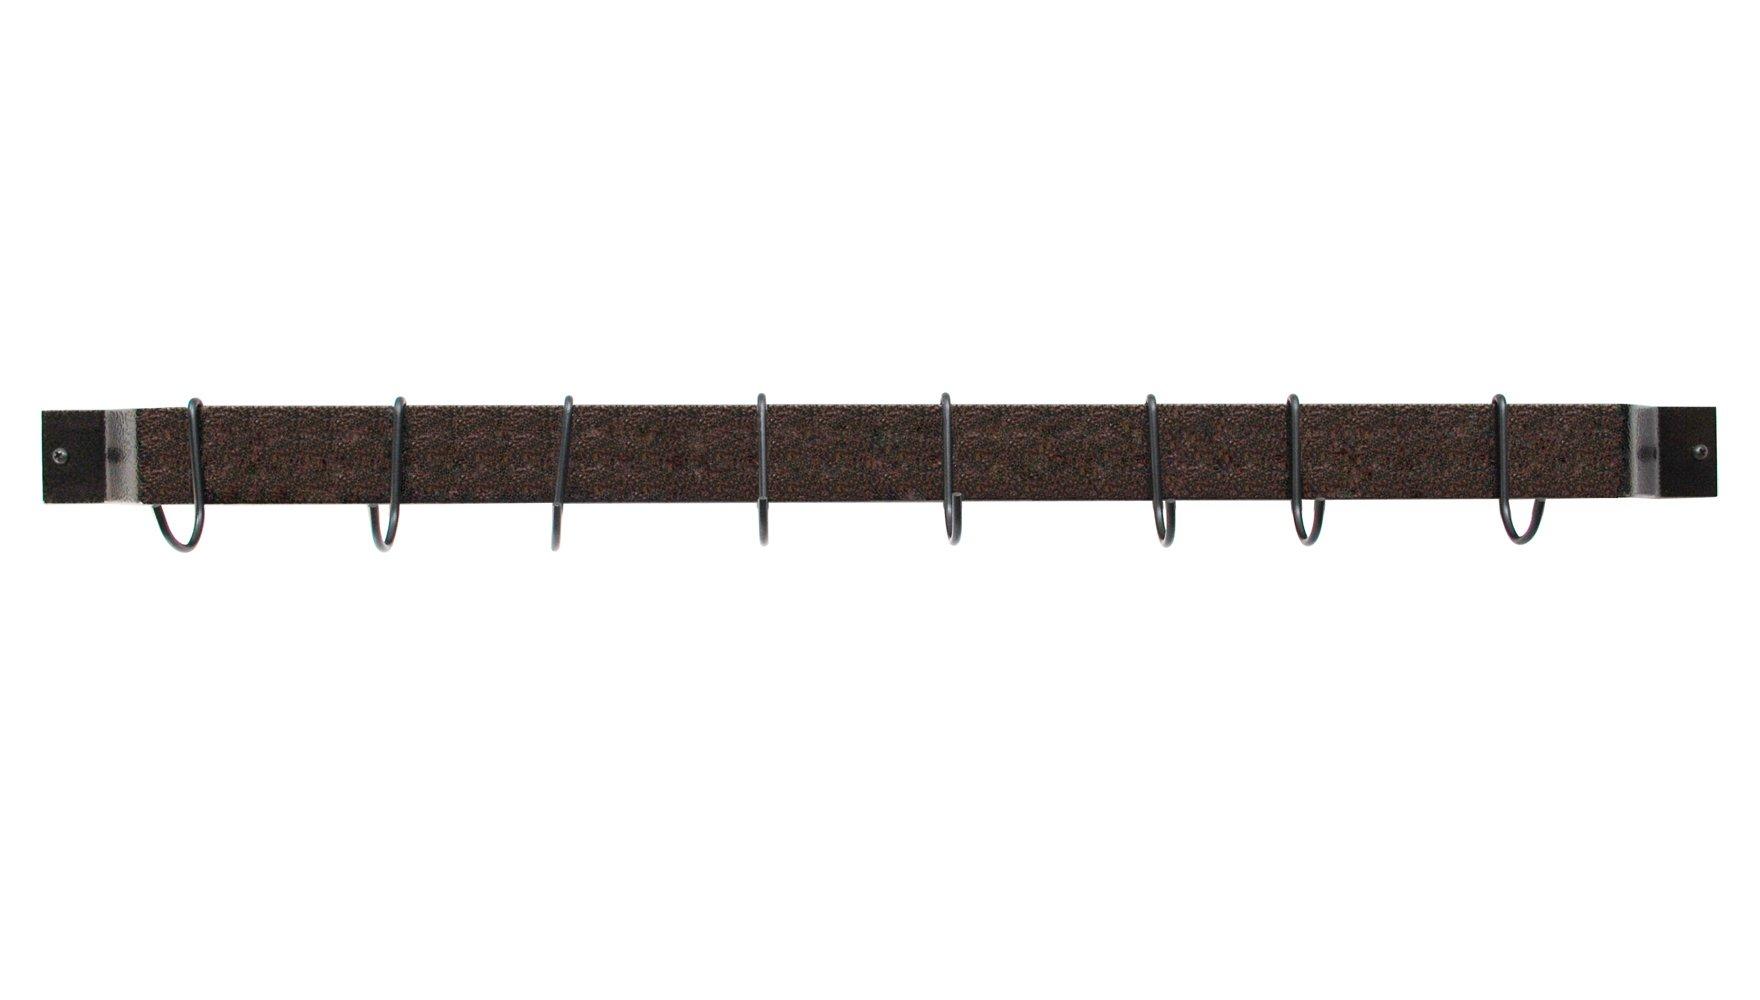 Rogar 36'' Wall Mounted Bar Potrack in Hammmered Copper & Black